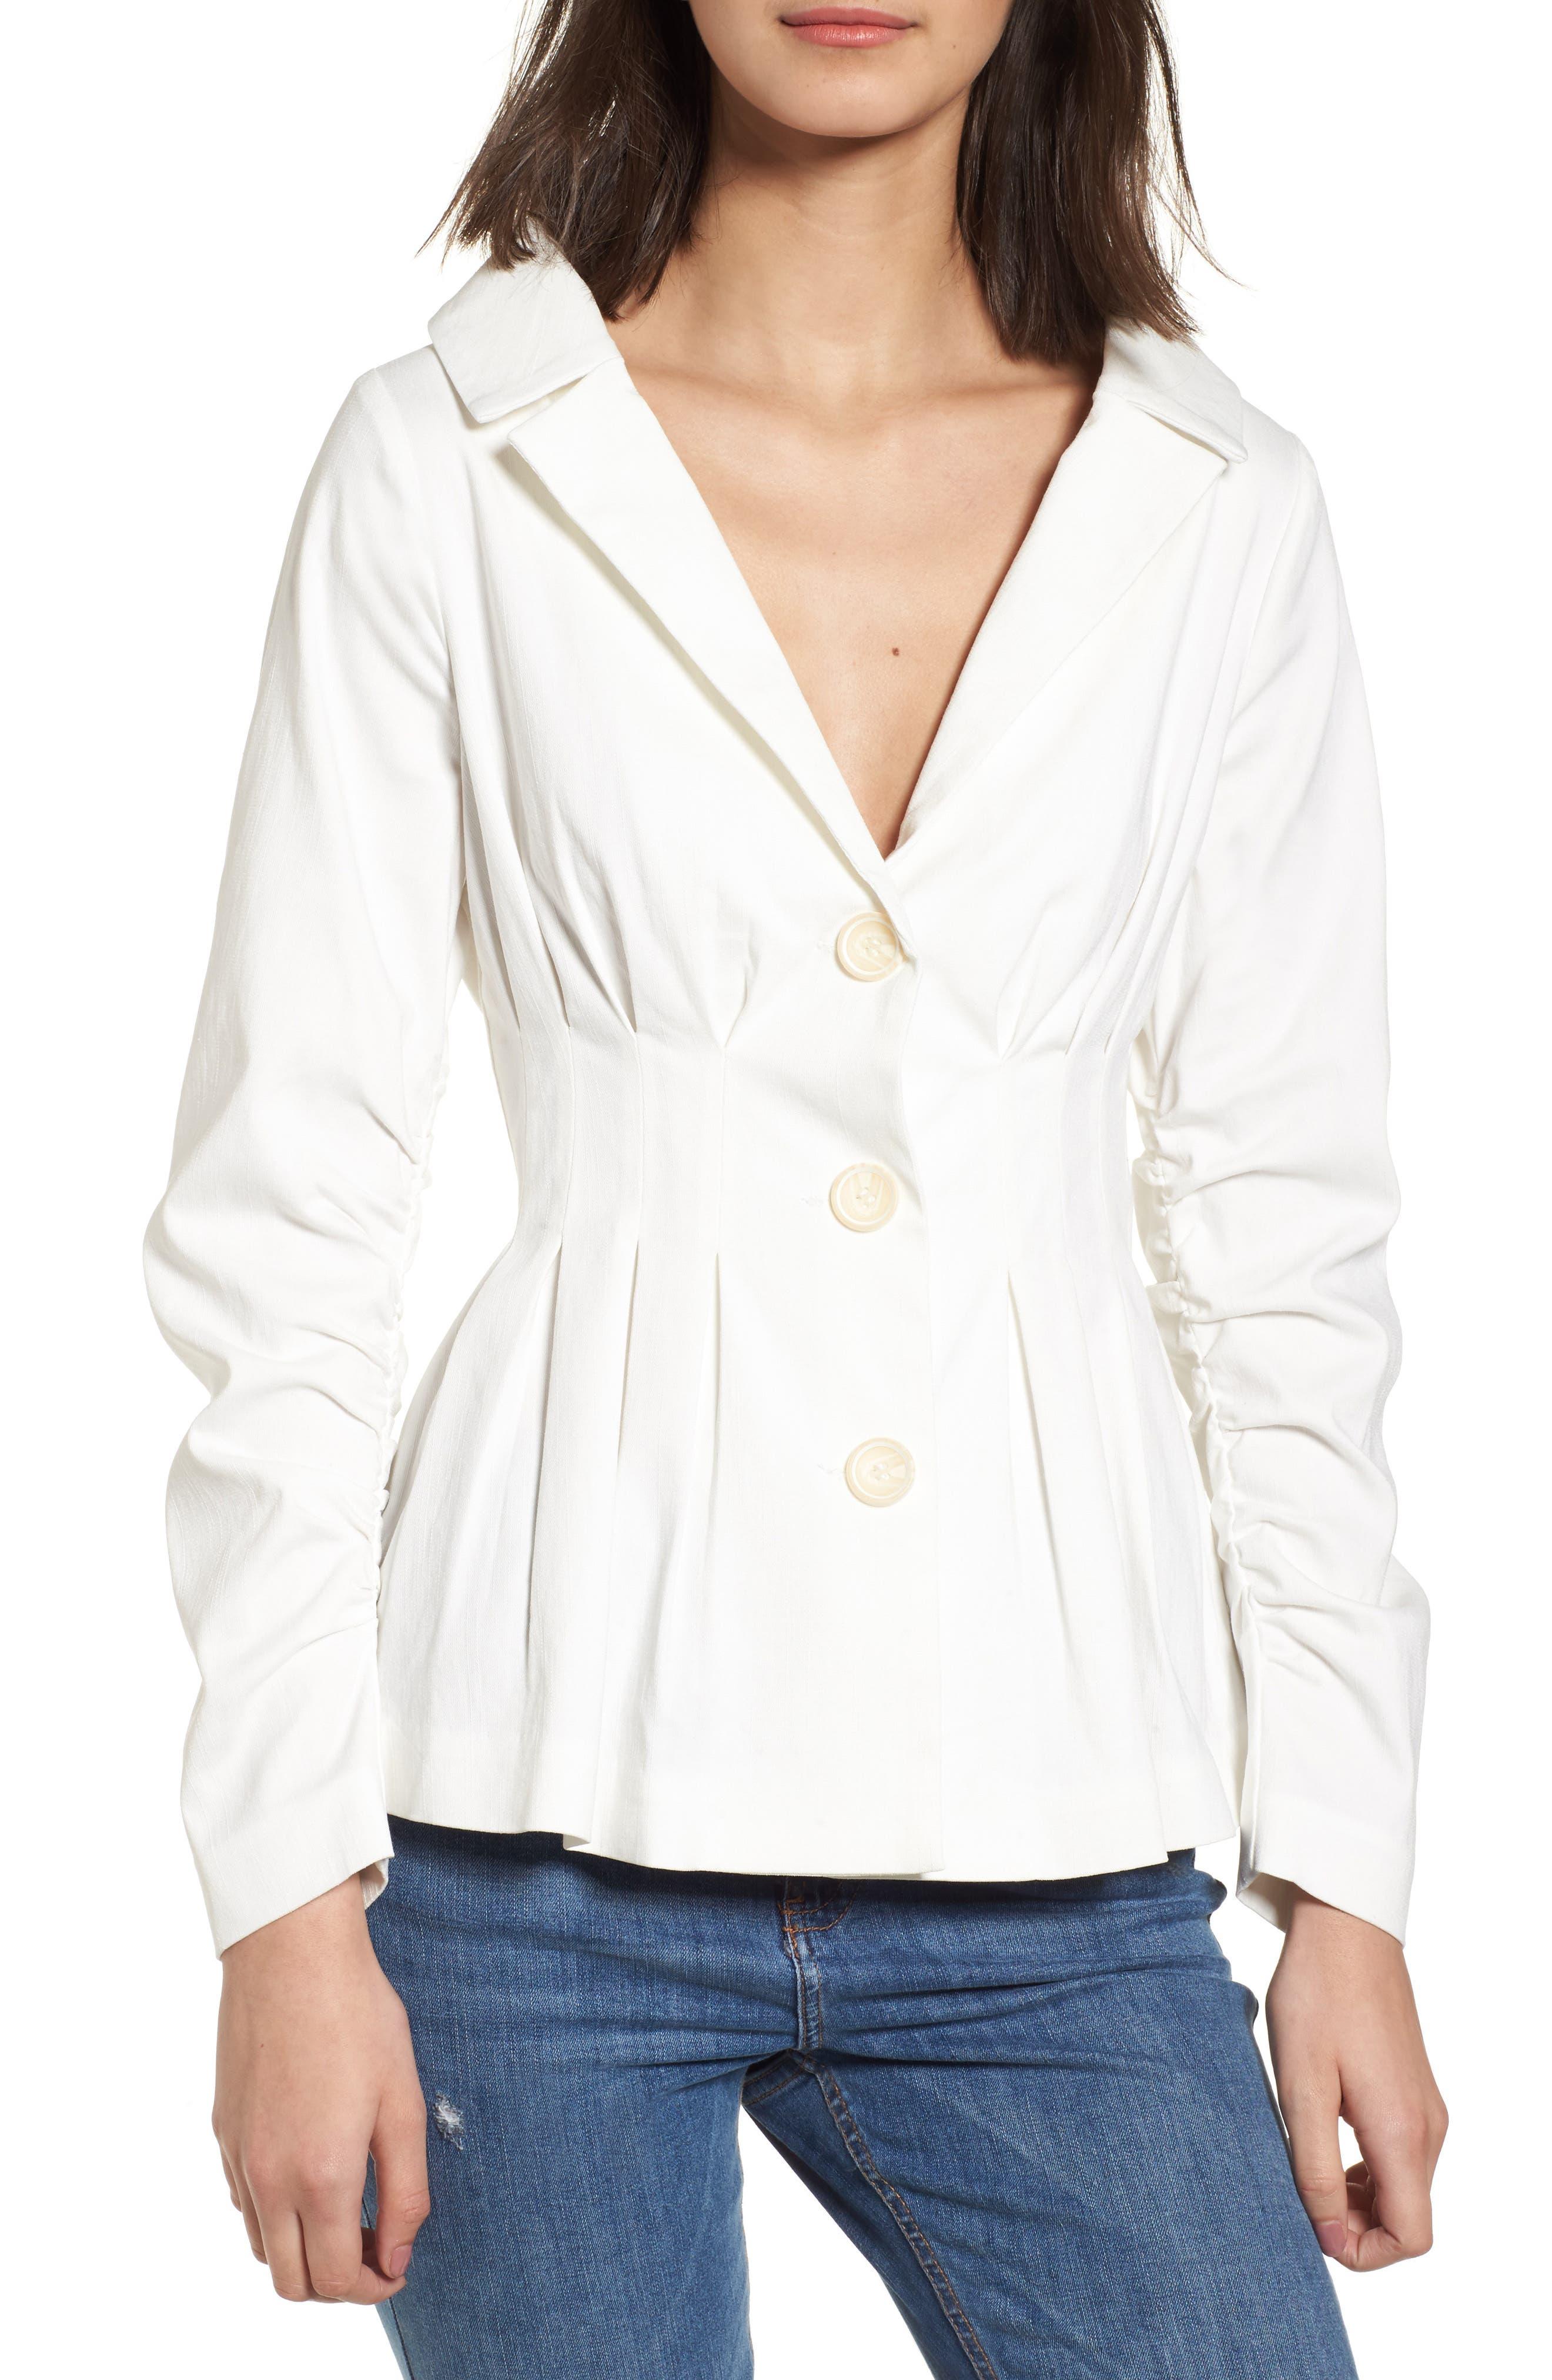 Main Image - LYDELLE Woven Jacket